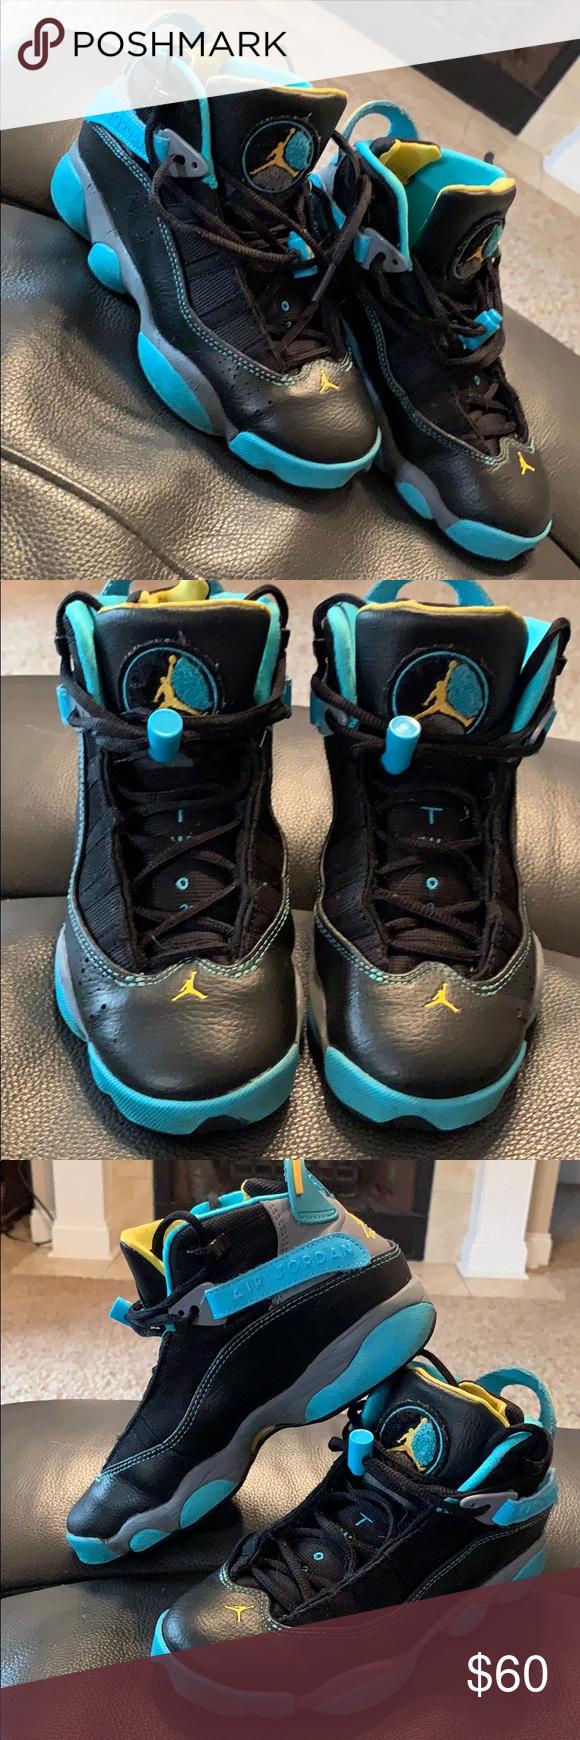 Jordan TW 03 shoes Jordan 91 92 93